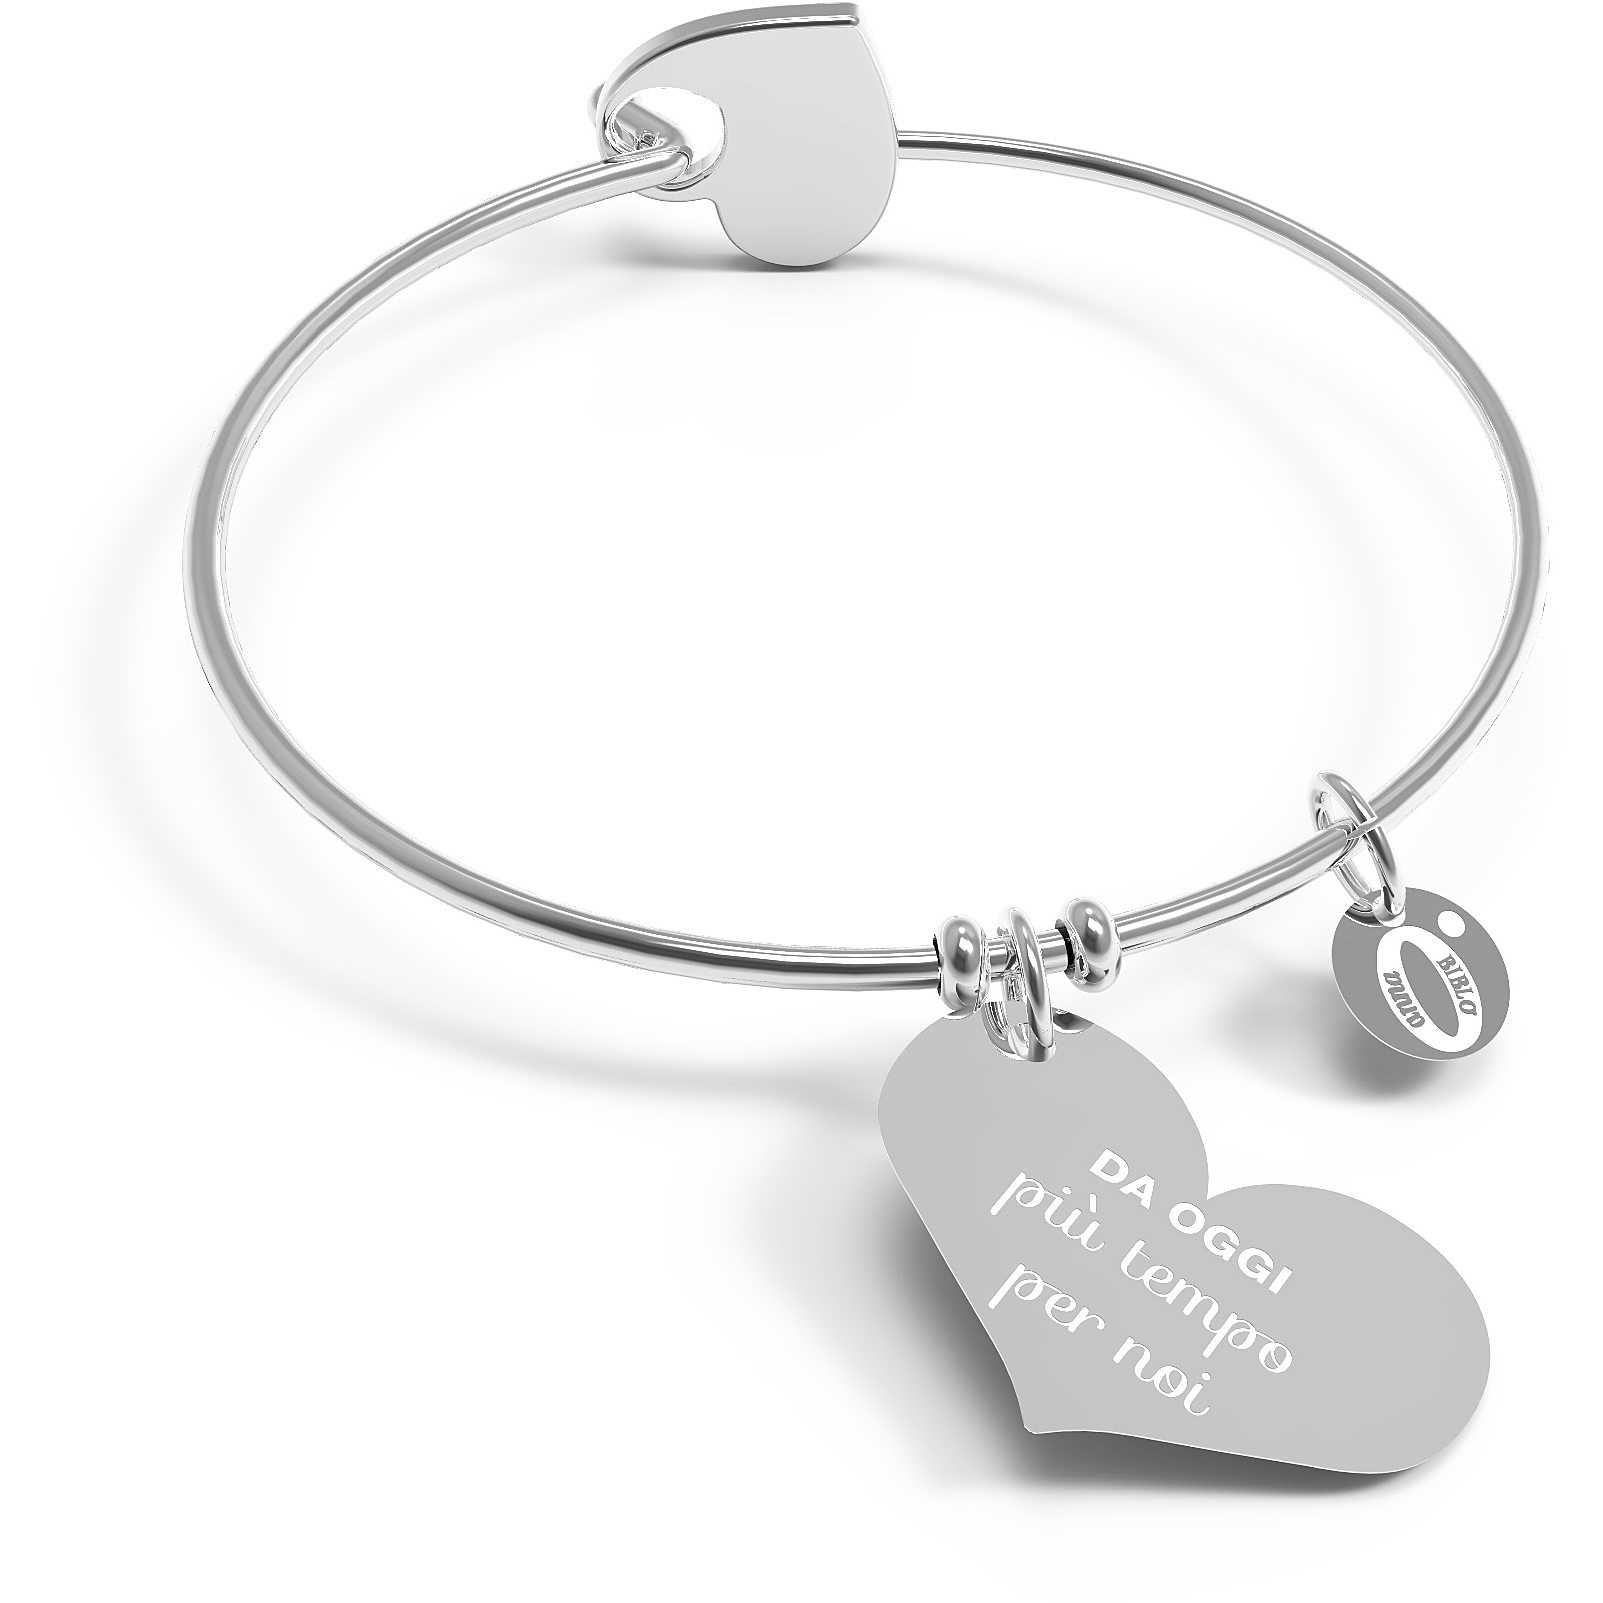 Bracelet Femme Propositi Bangle B5155 Buoni Icon Bijoux 10 Heart JFl1Kc